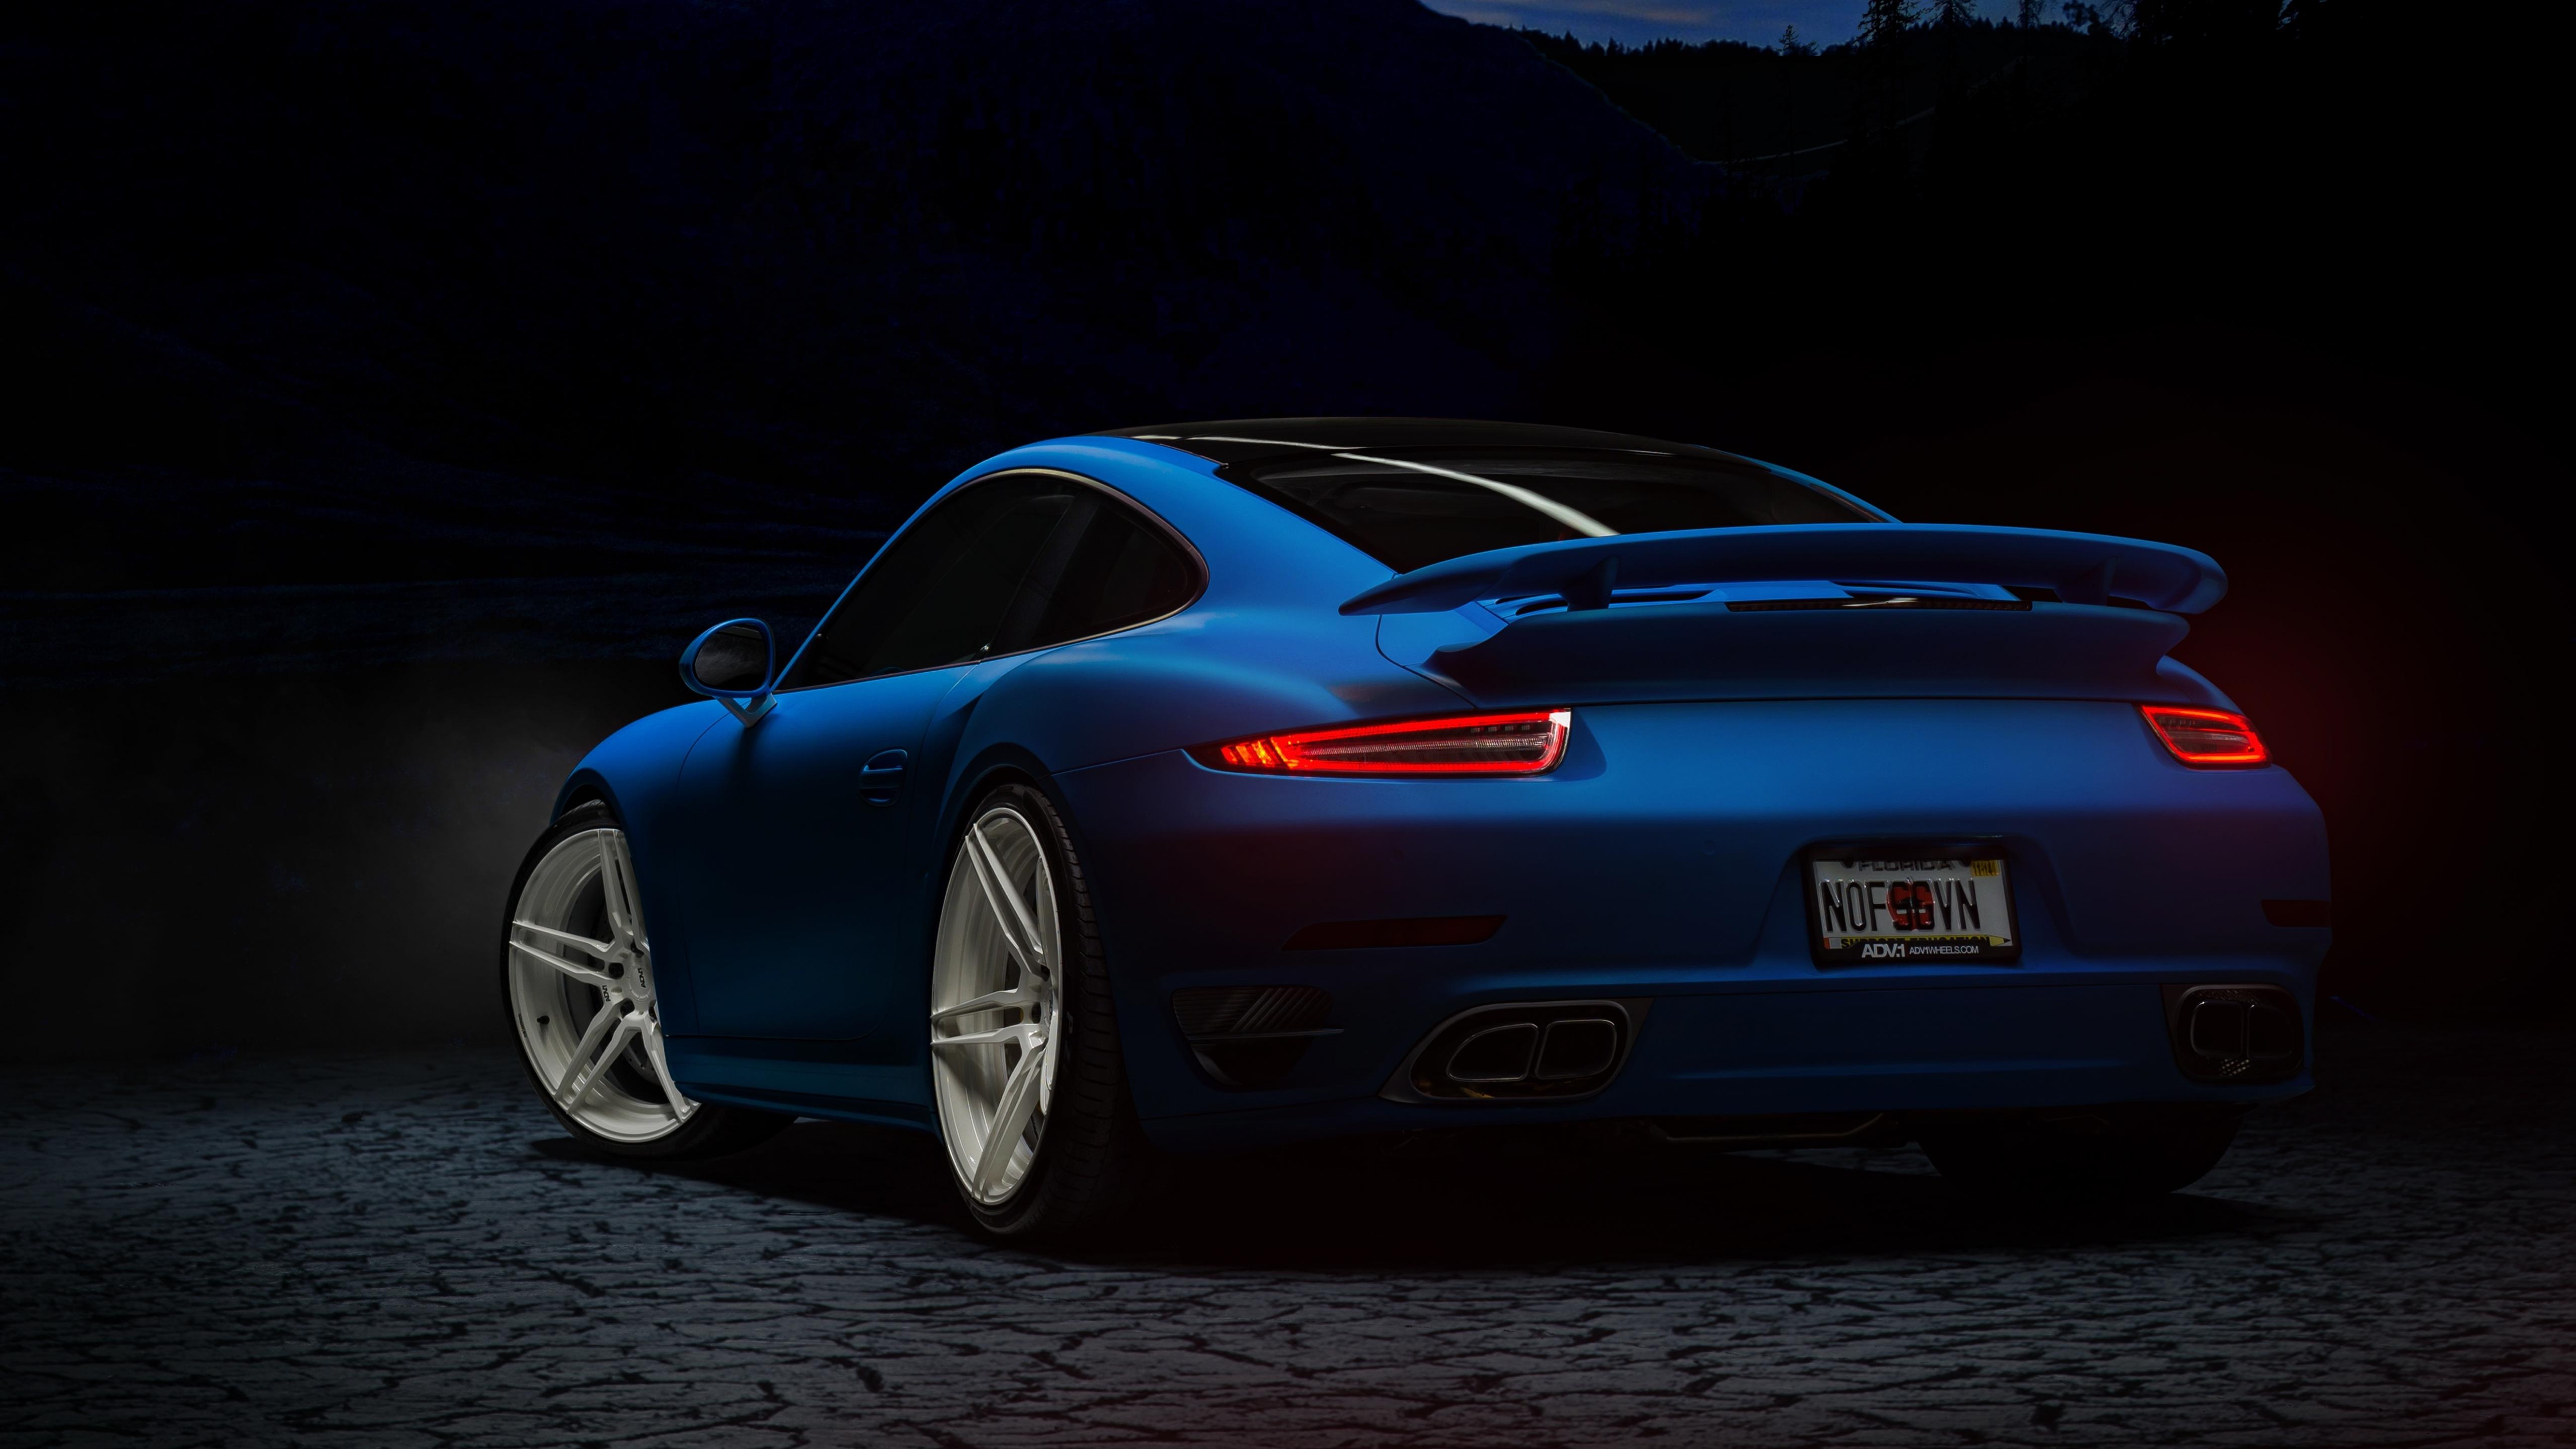 Download 5120x2880 wallpaper sports car porsche 911 turbo - Sports car pictures download ...